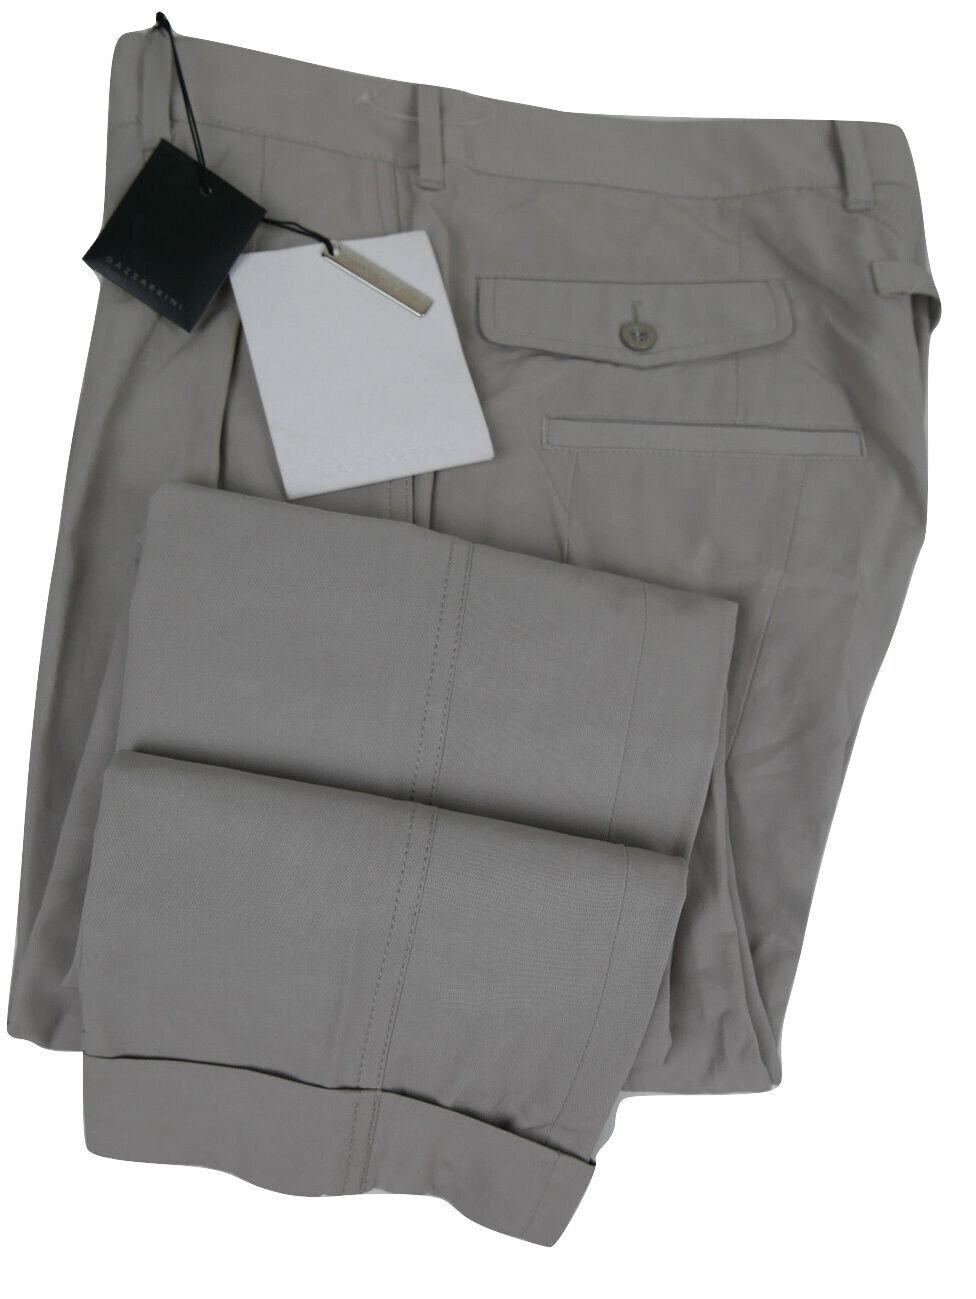 GAZZARRINI NAPOLI 32 EU Cotone Slim ITALIANO nwts Pantaloni Marco HAND MADE